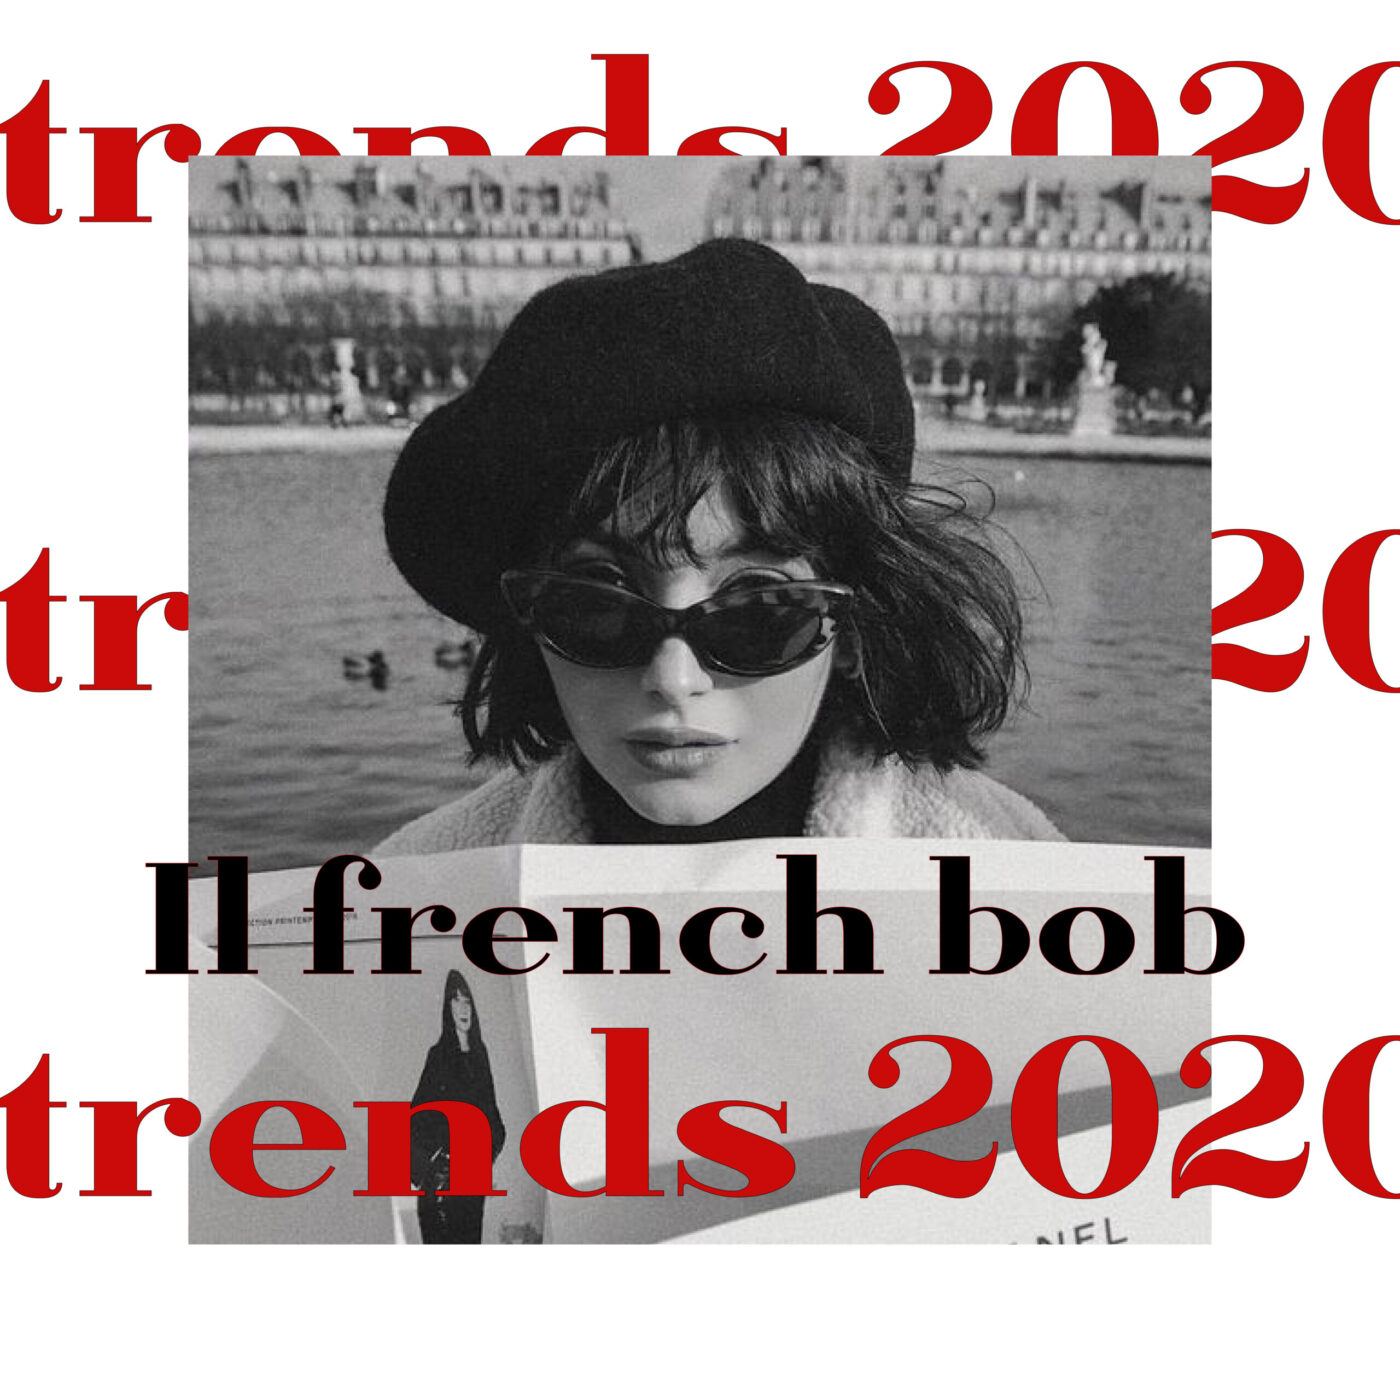 Post French bob